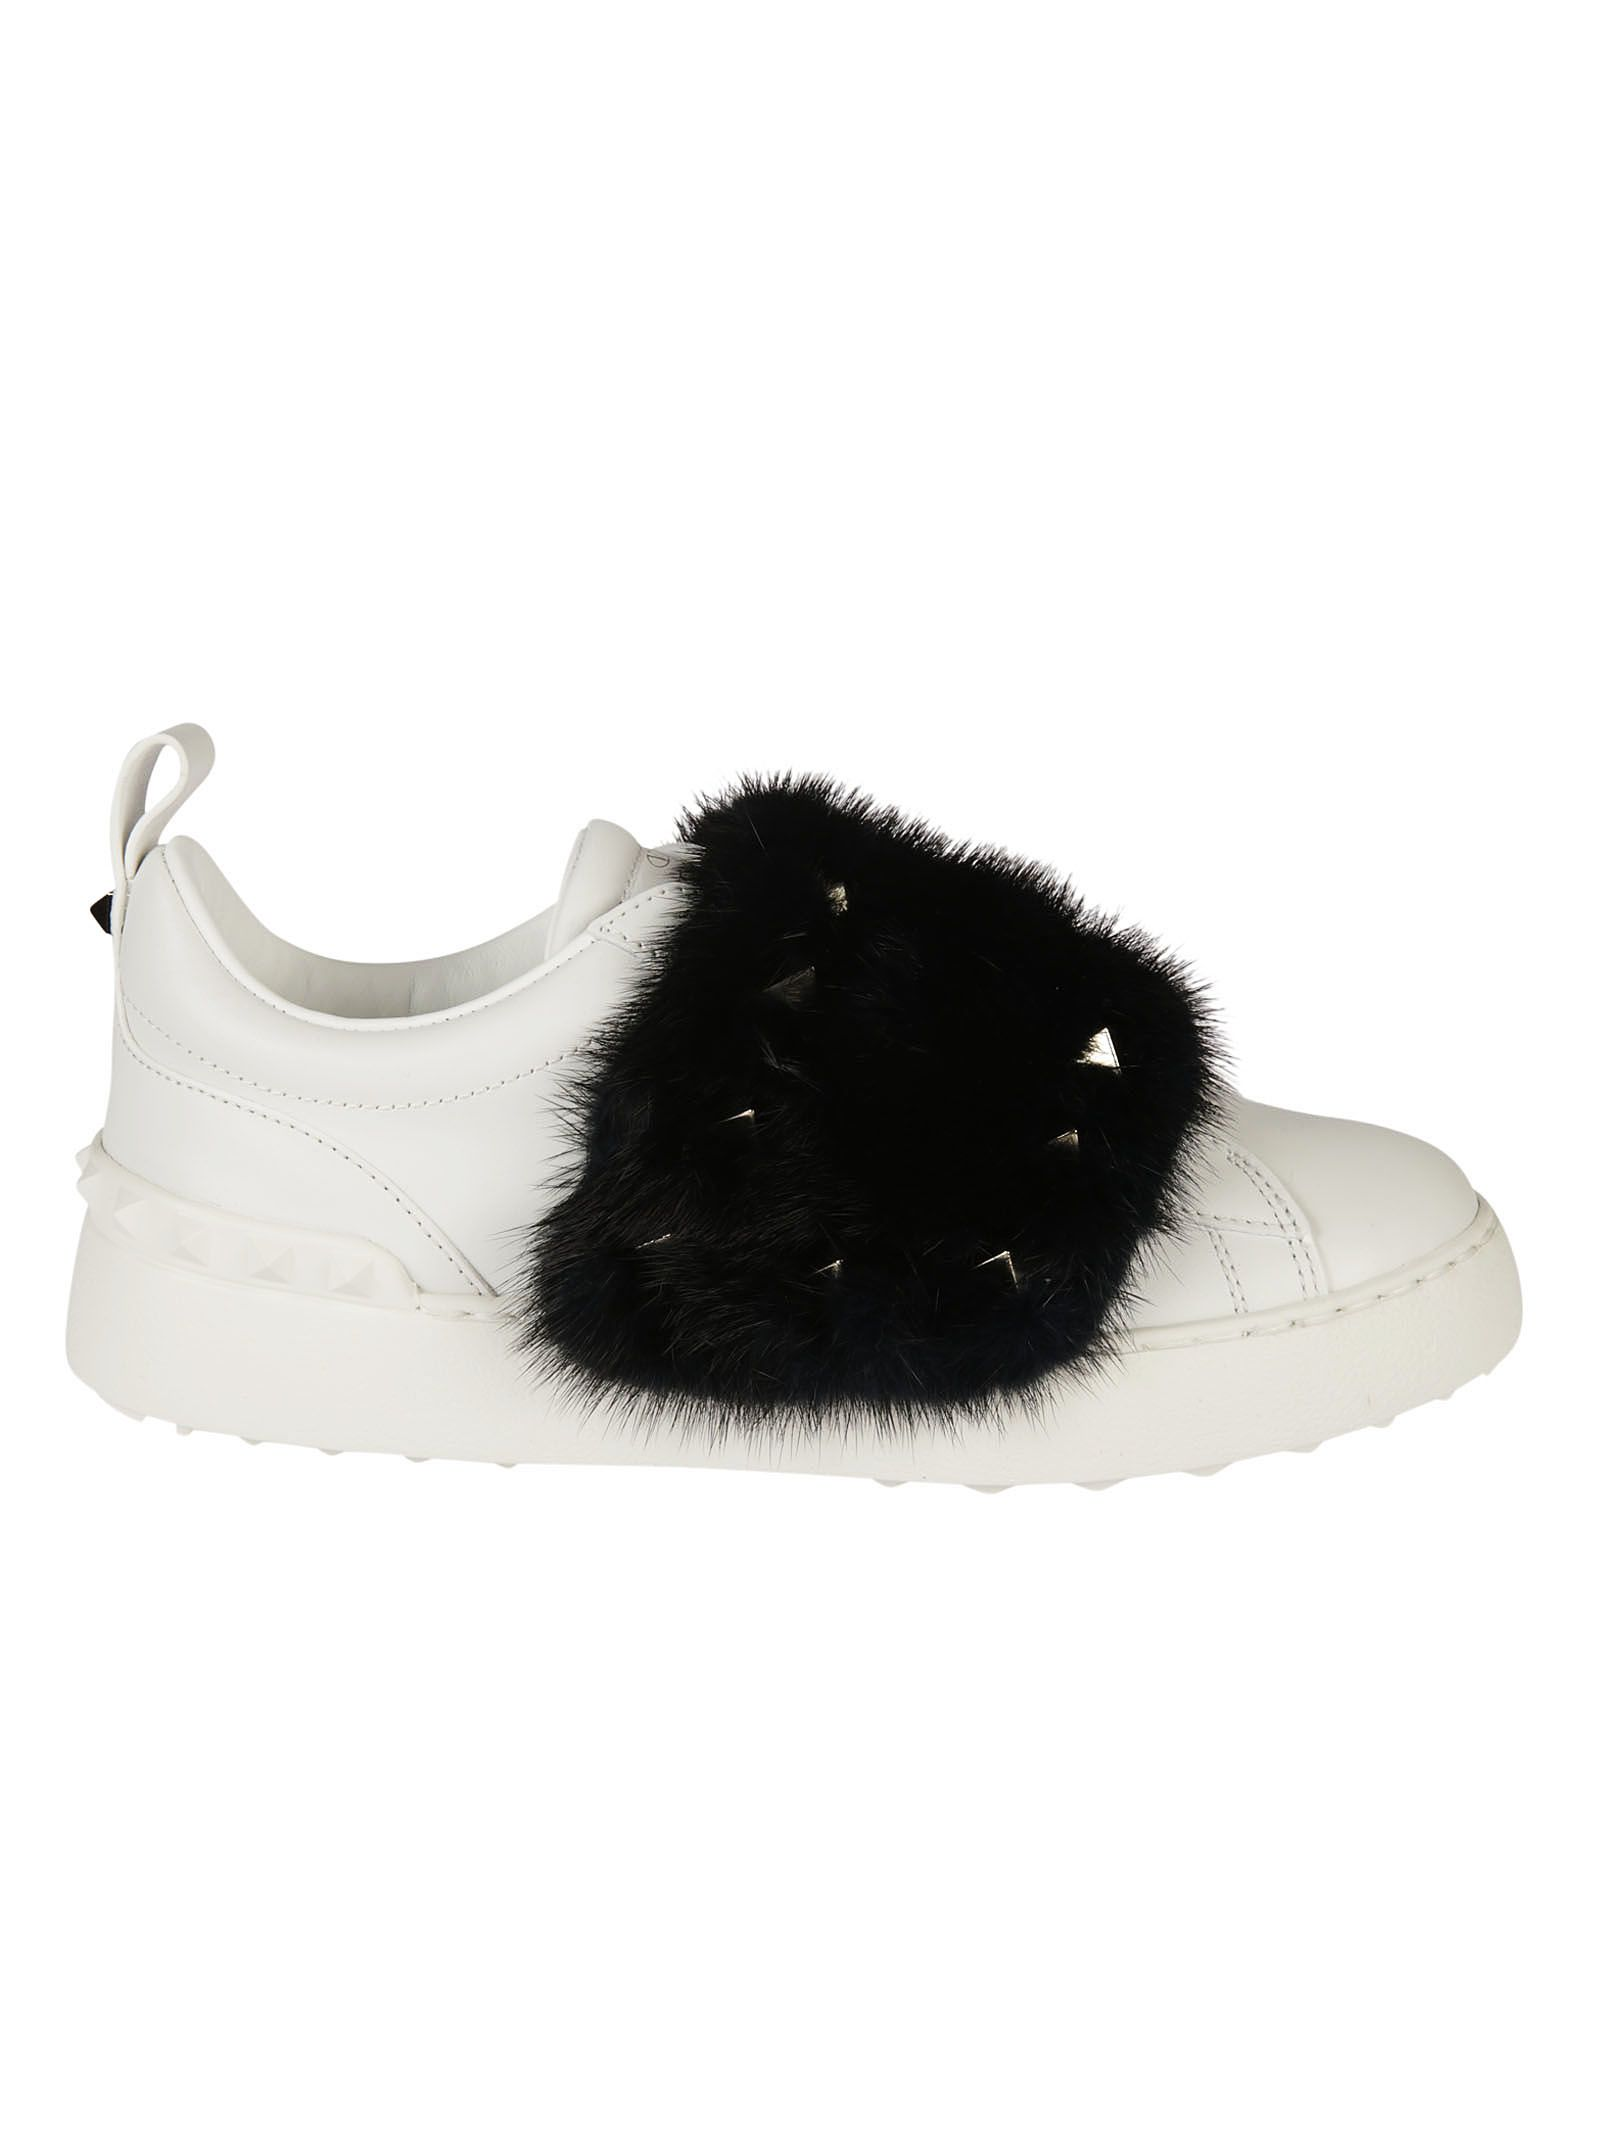 Valentino Garavani Mink Fur Sneakers